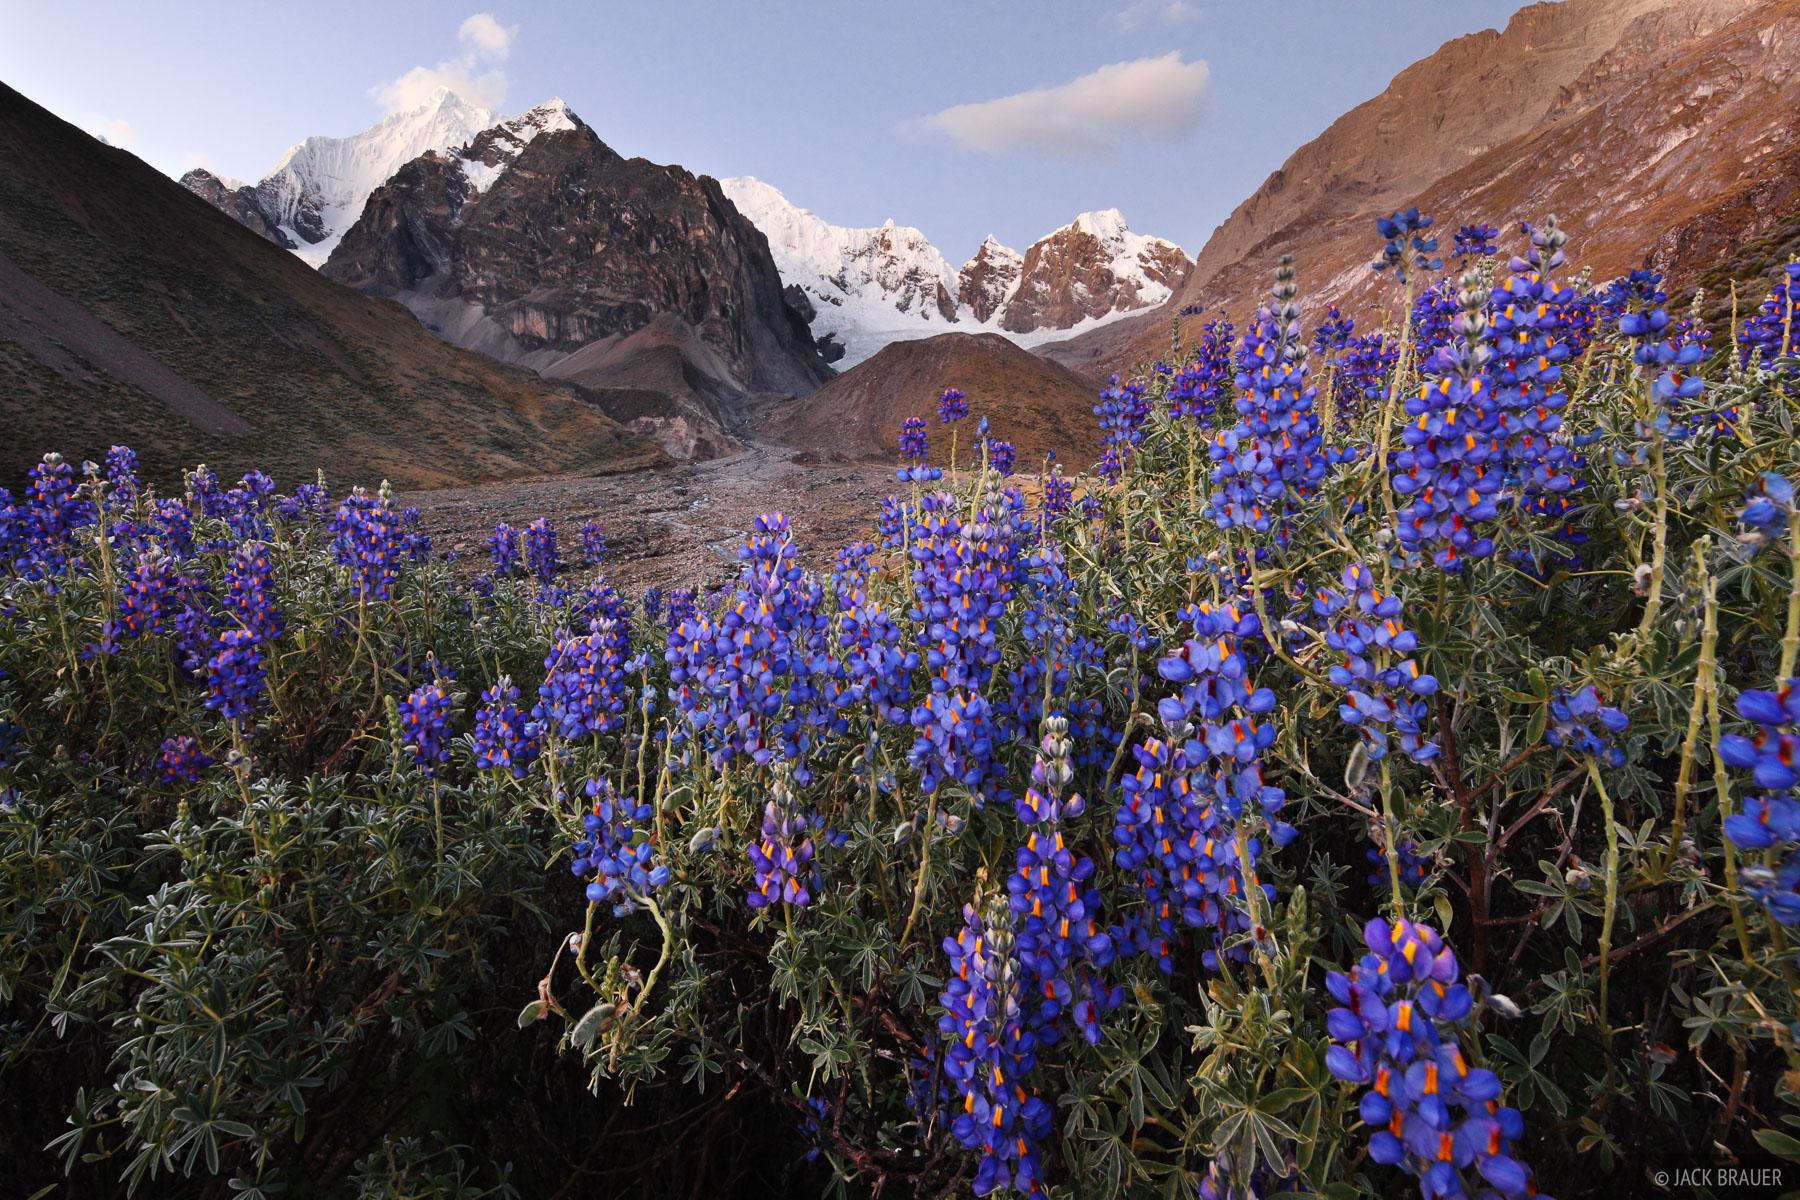 Cordillera Huayhuash, Peru, wildflowers, lupines, Sarapo, Rio Calinca, photo